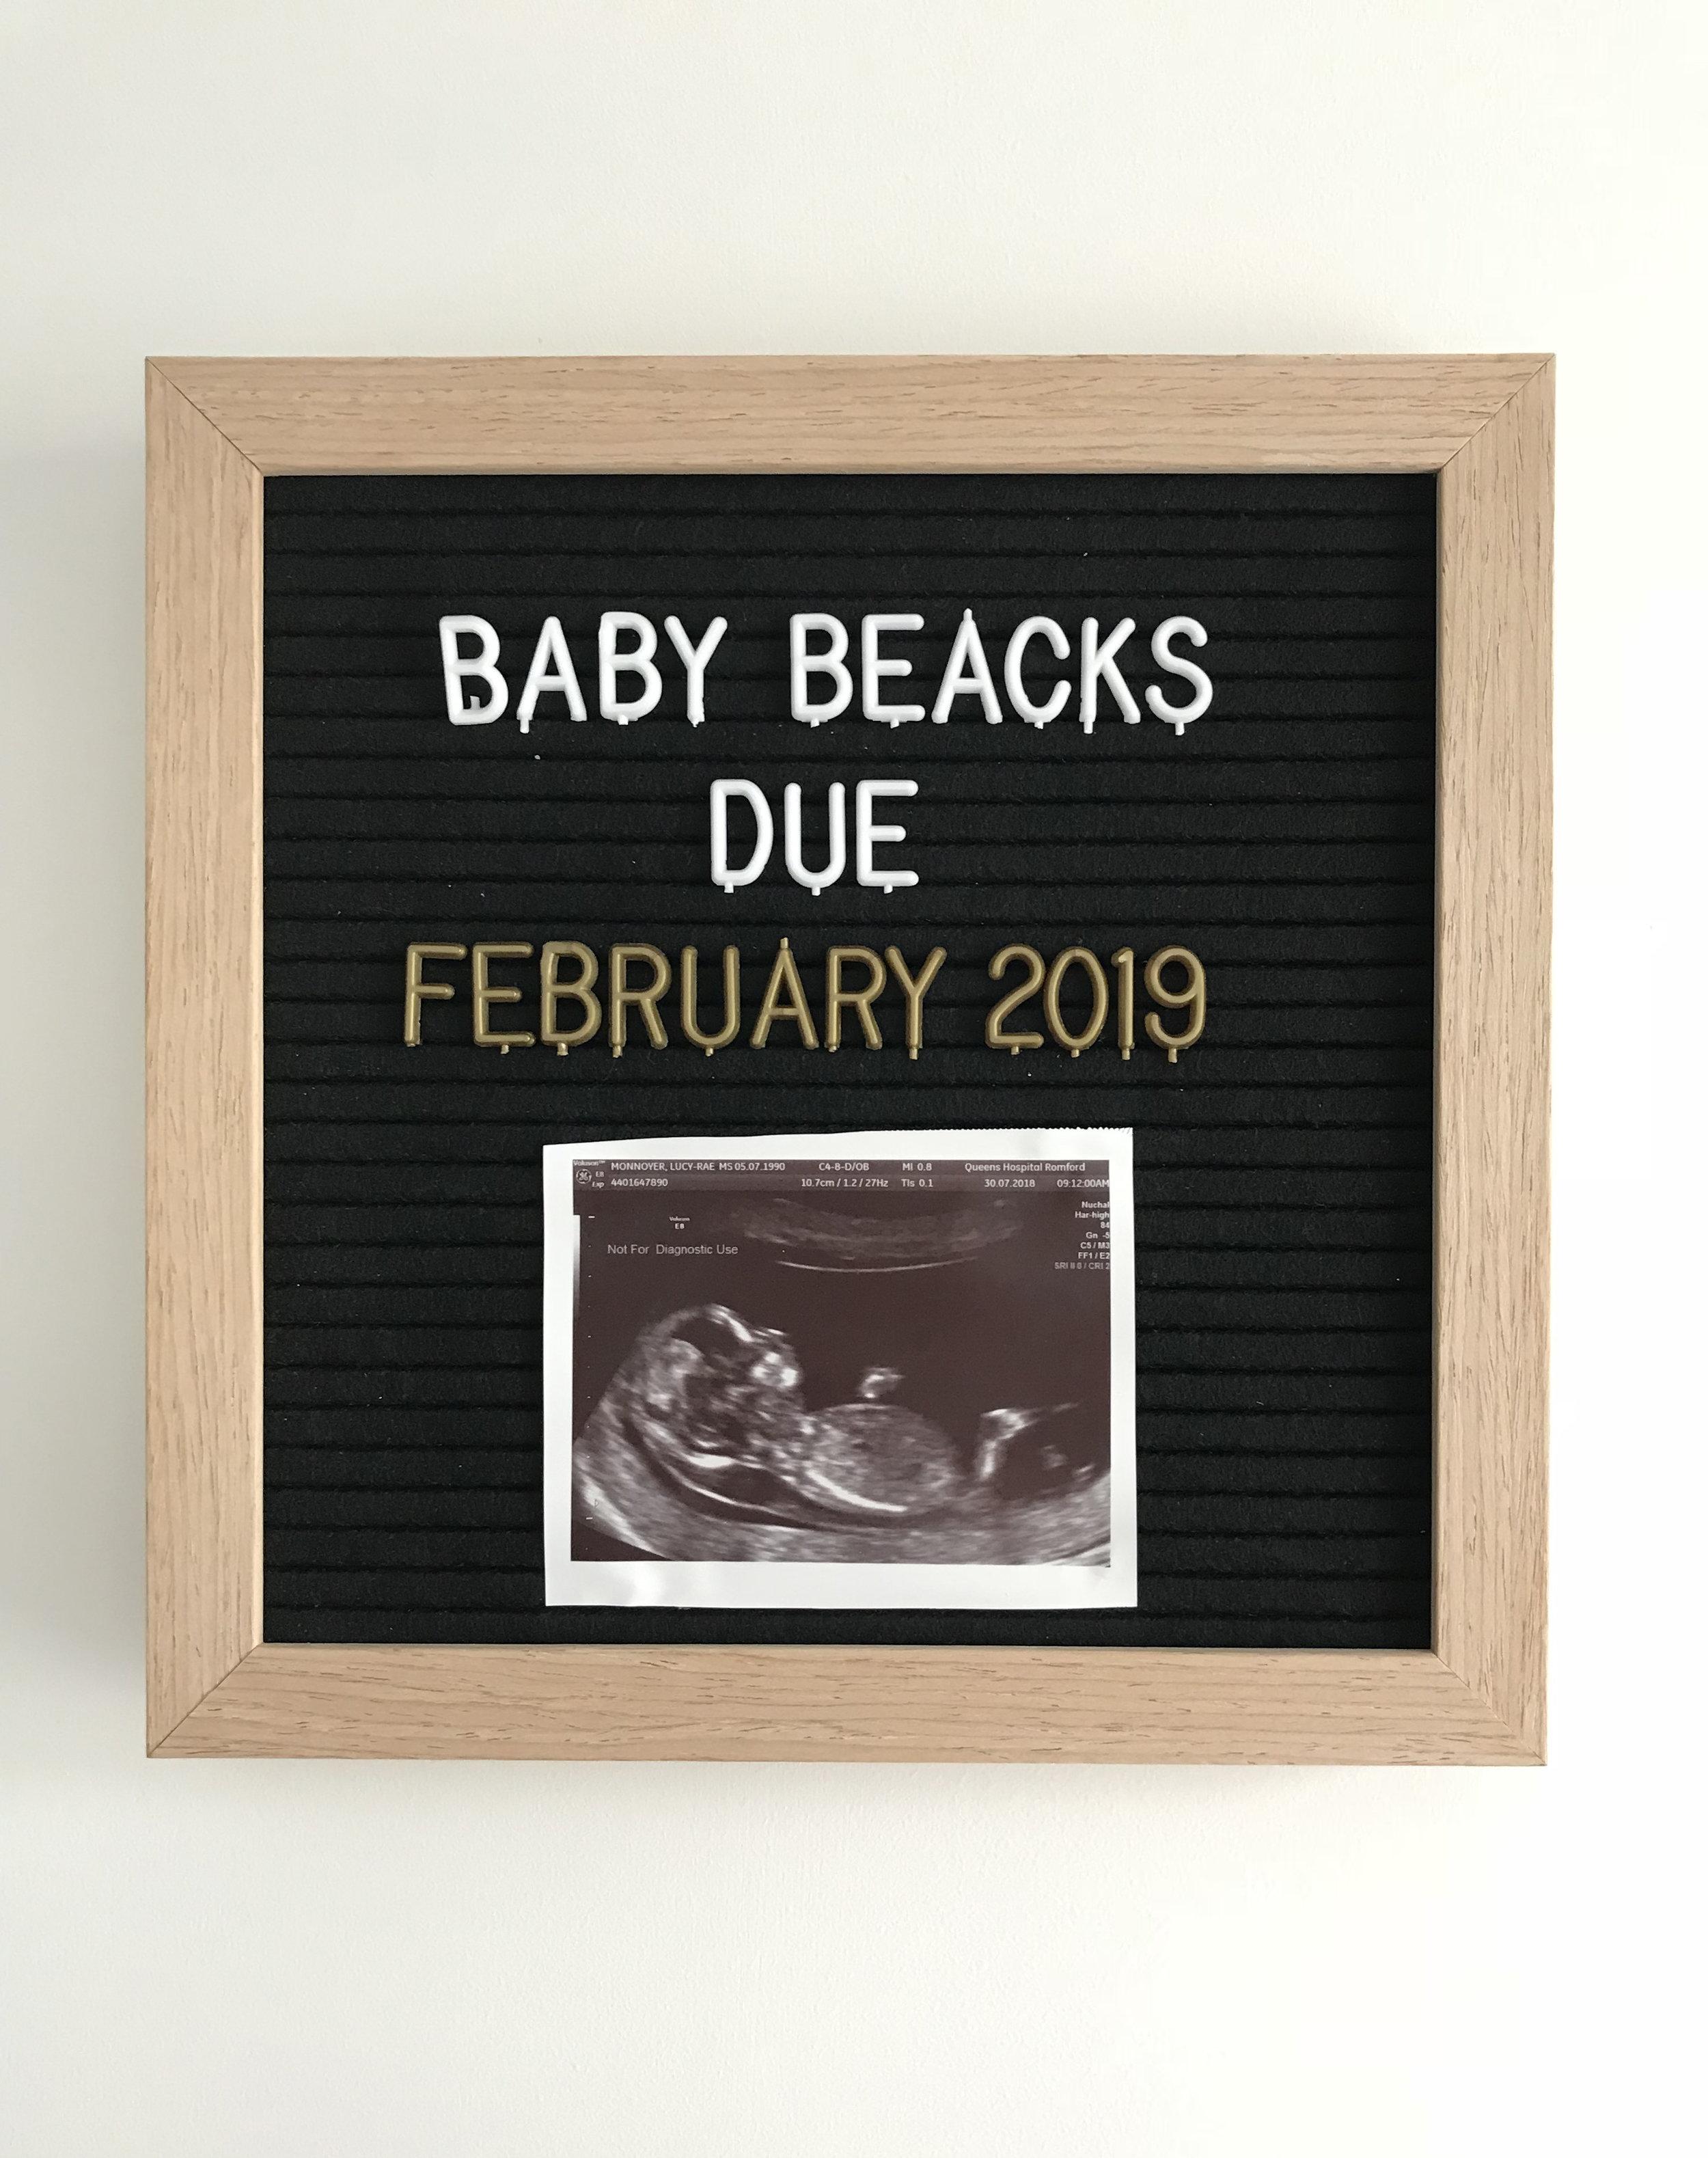 Baby Beacks Announcement.jpg